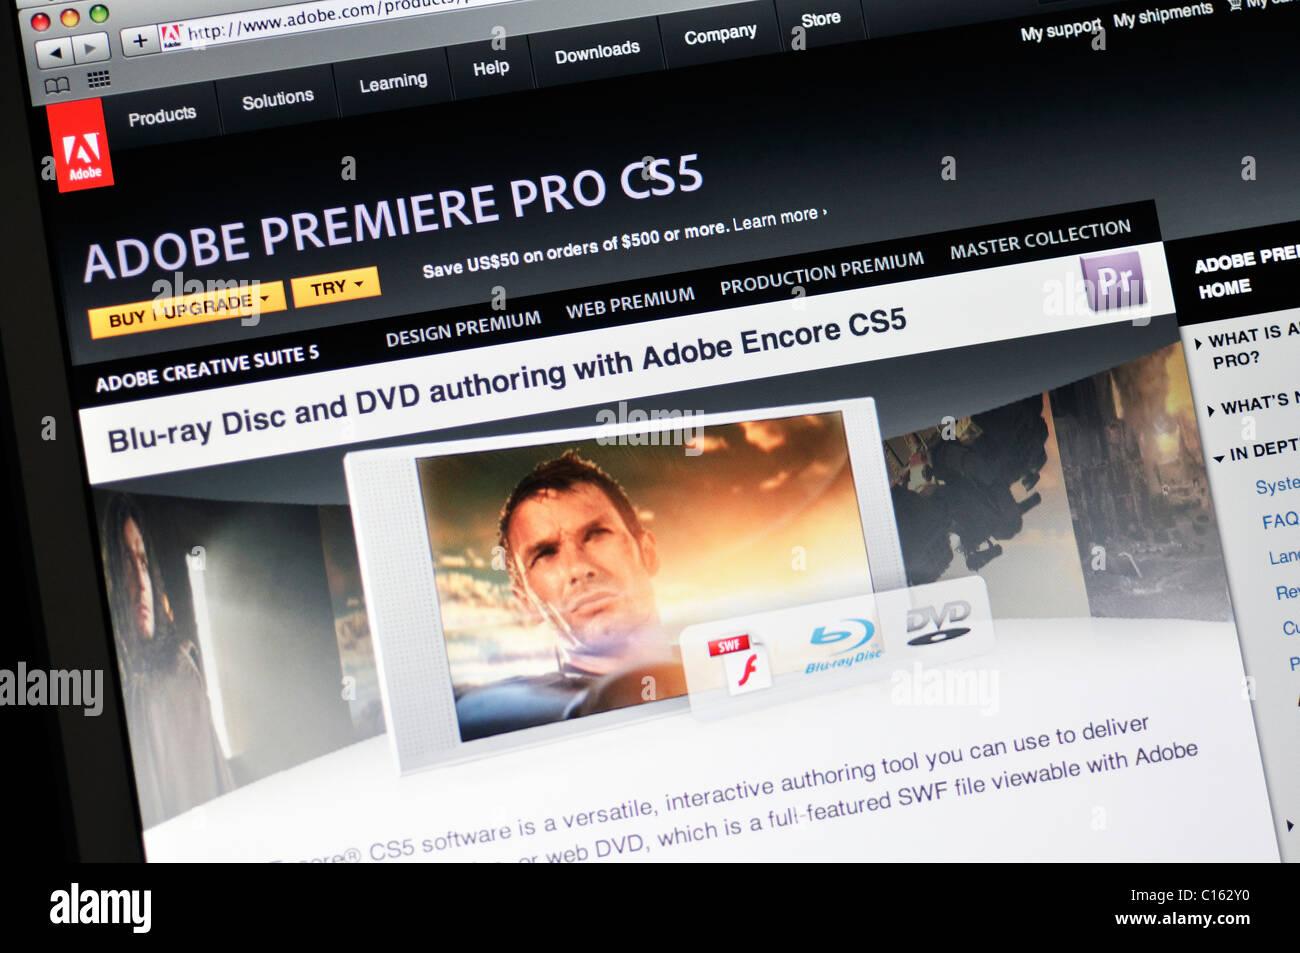 Adobe Premiere Pro CS5 Web Imagen De Stock